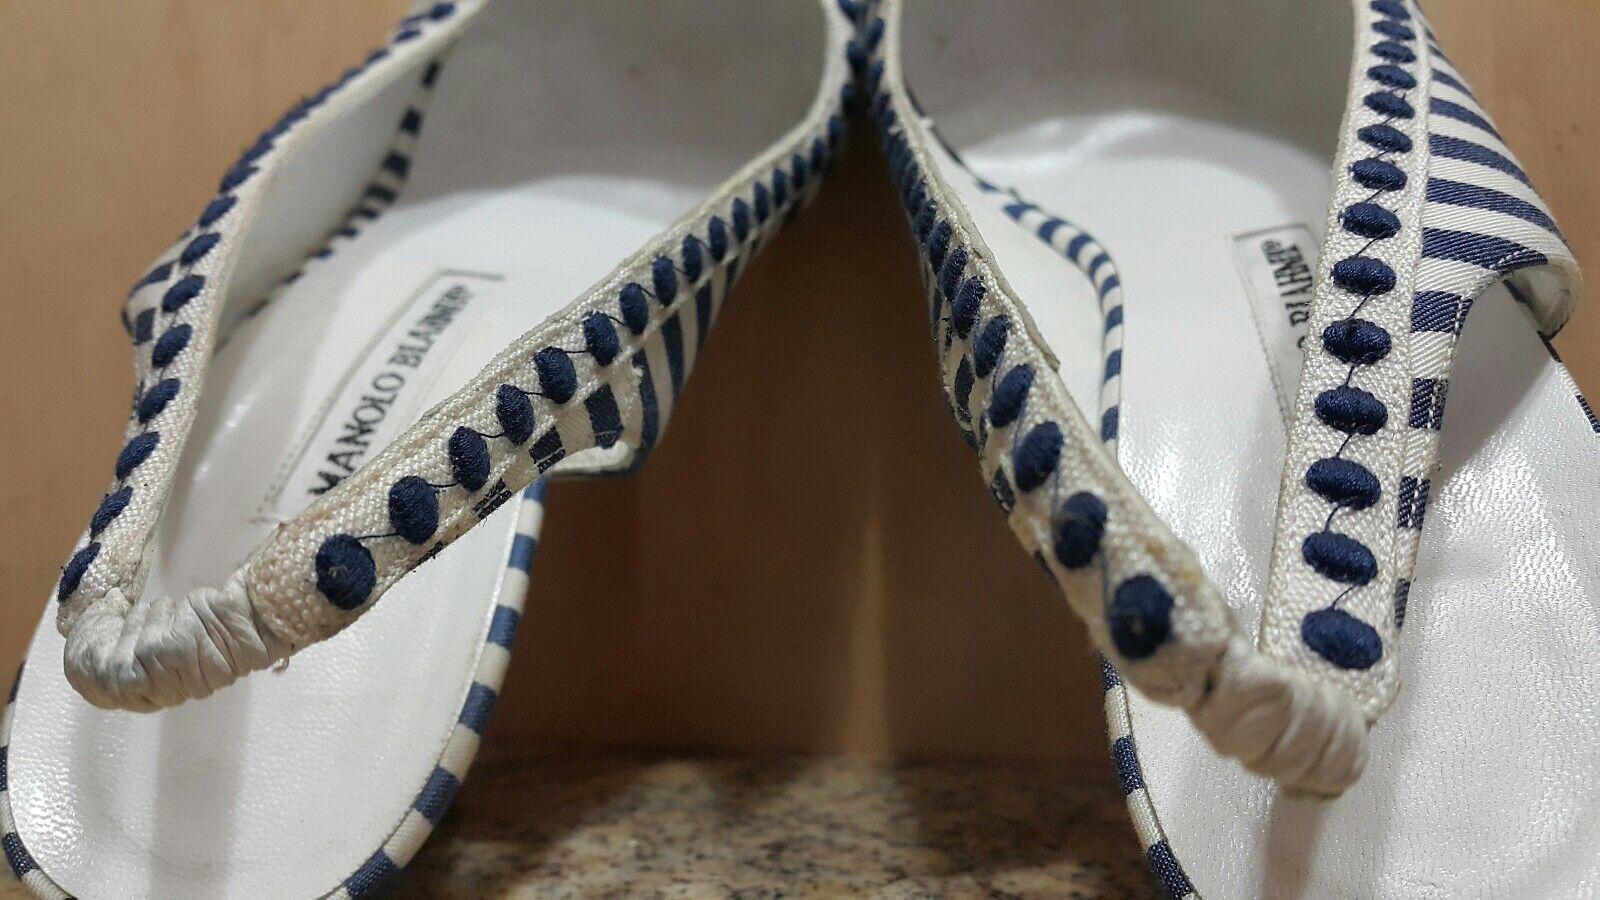 Manolo BLANHIK Blau Blau Blau Weiß Striped Satin Square Toe Slingback Heels 531c52